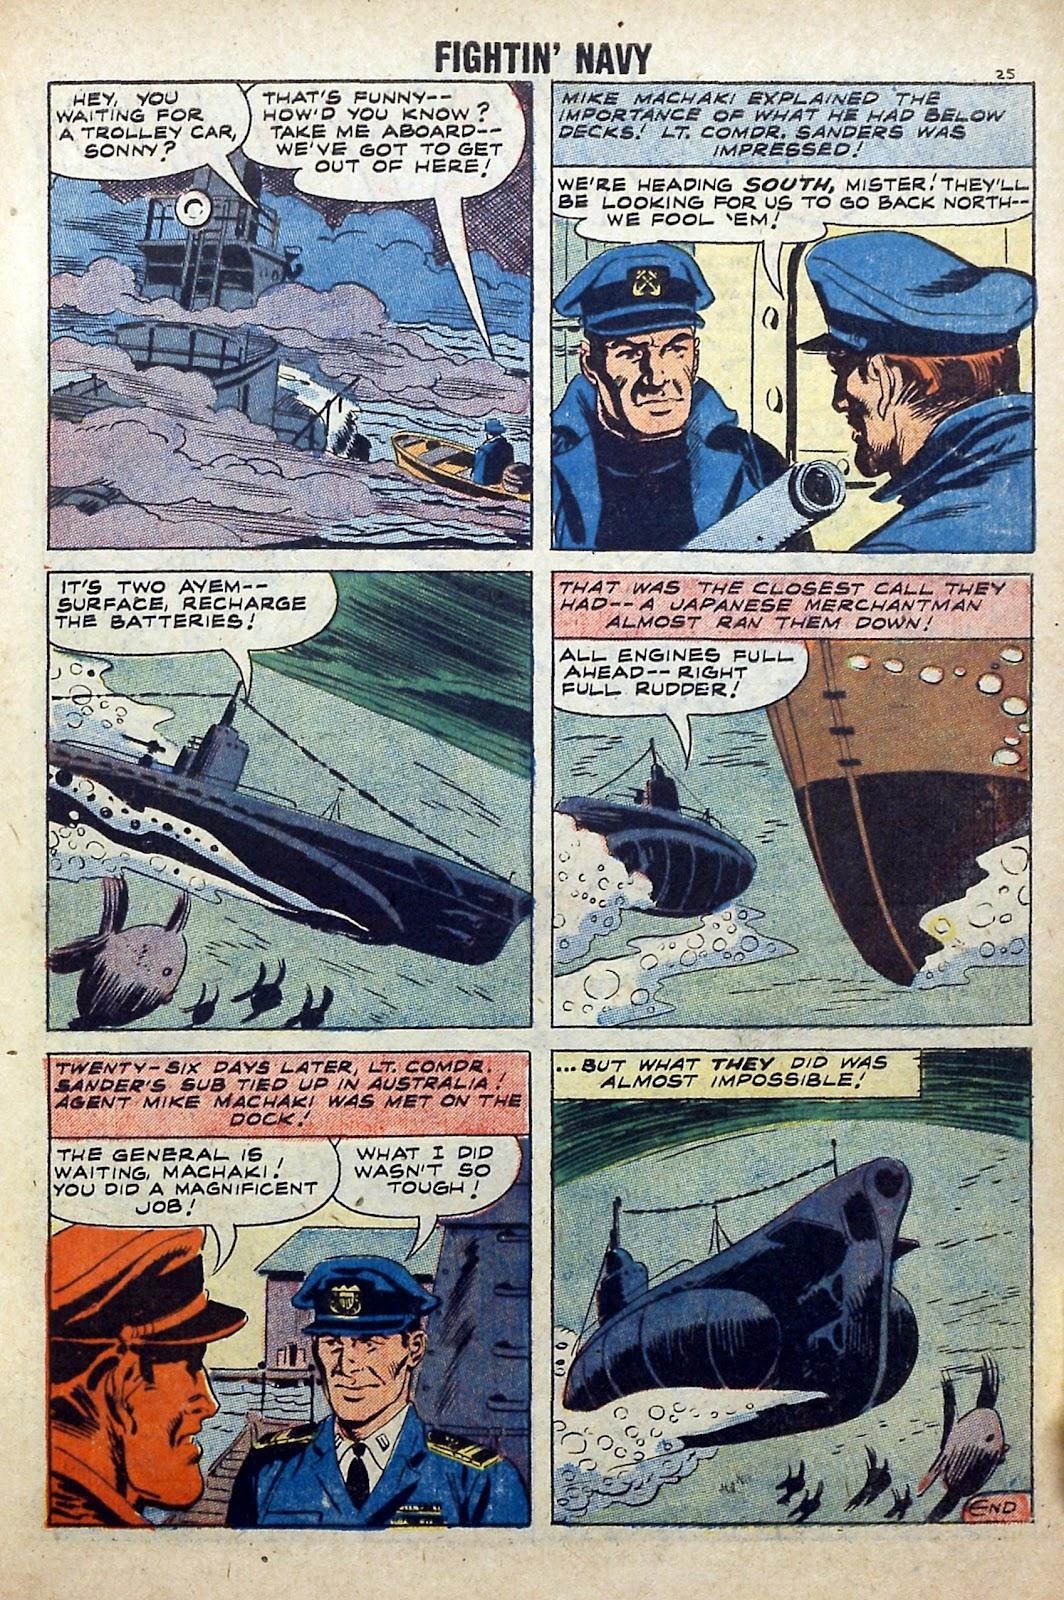 Read online Fightin' Navy comic -  Issue #84 - 27